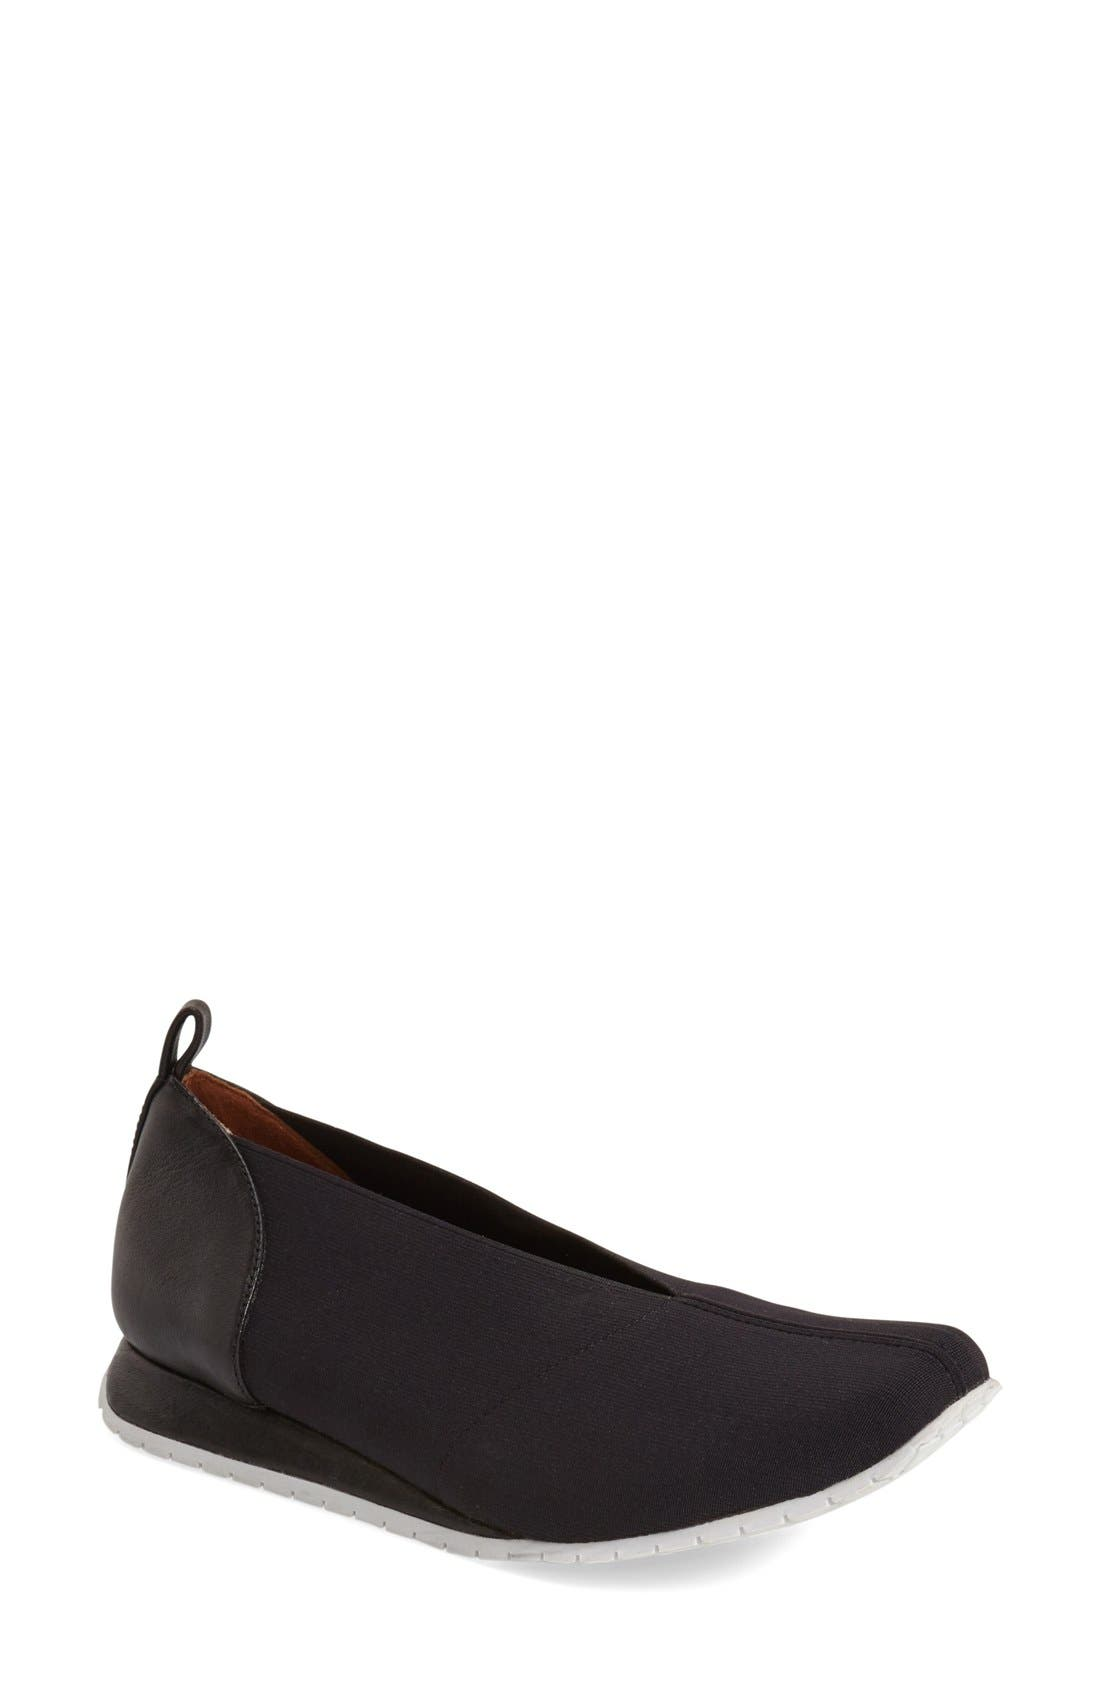 'Telfer' Slip-On Sneaker,                         Main,                         color, Black Stretch Fabric